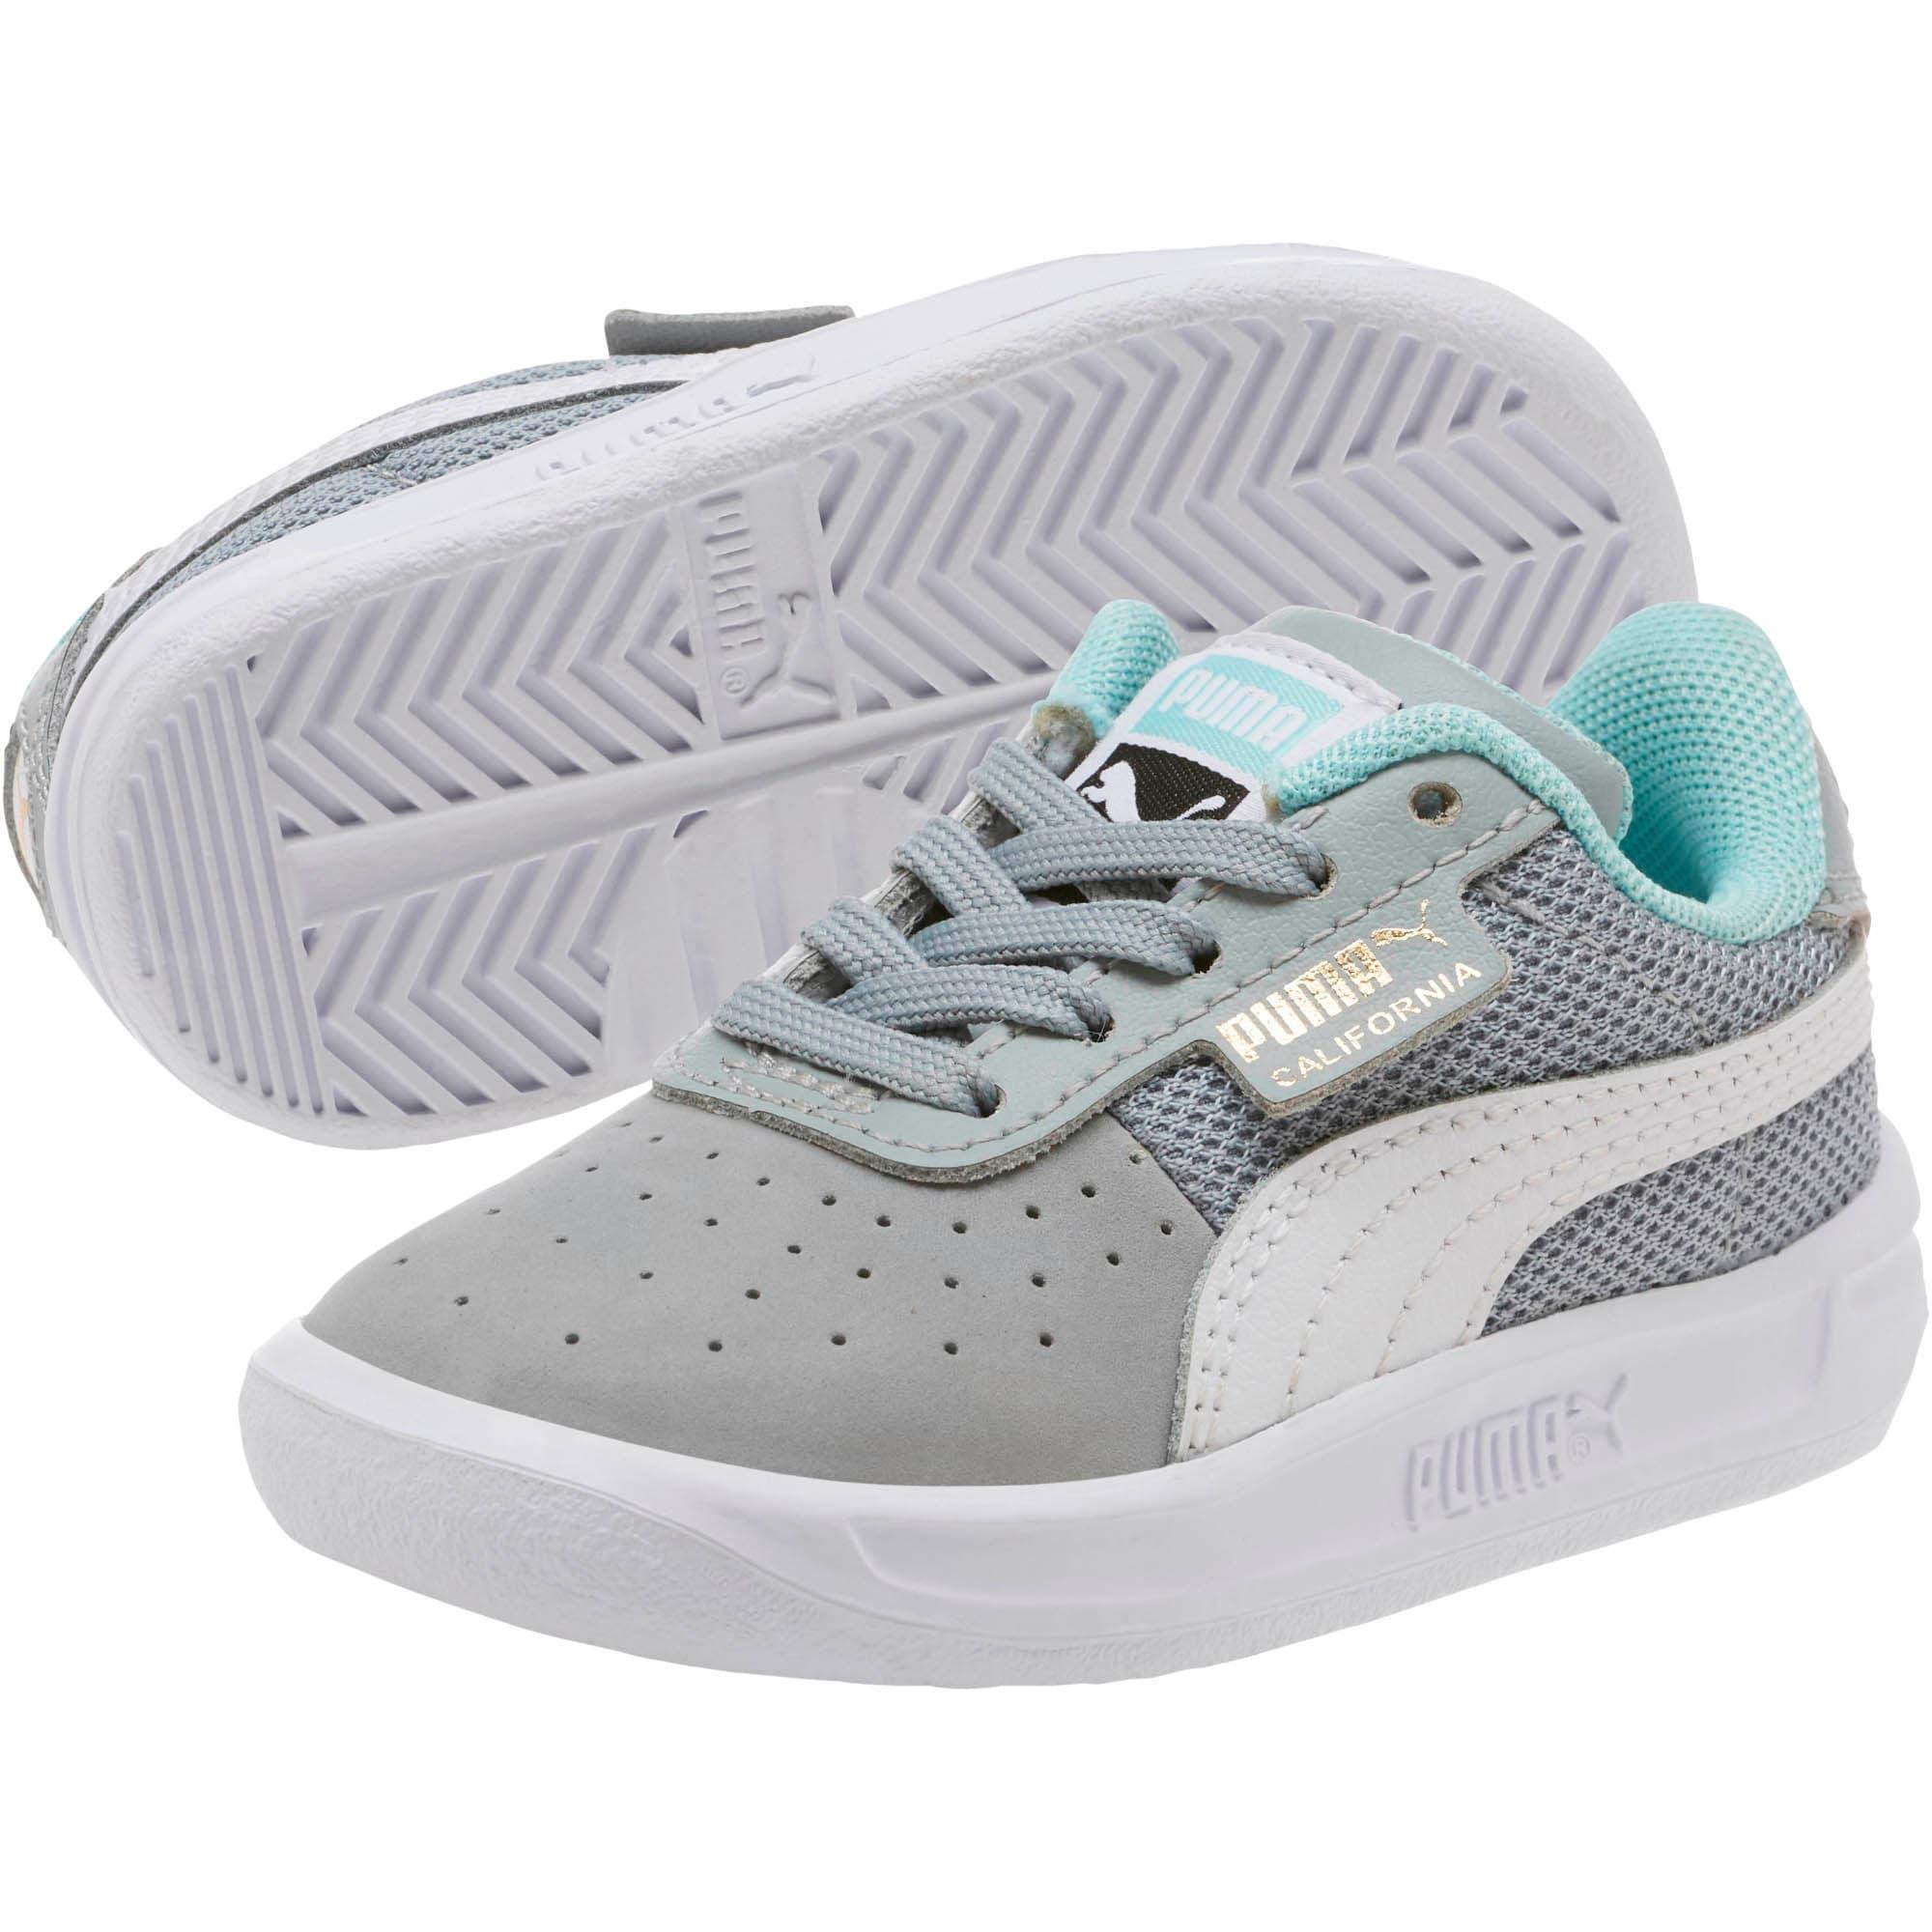 Thumbnail 2 of California Casual Toddler Shoes, Quarry-Puma White-Gold, medium